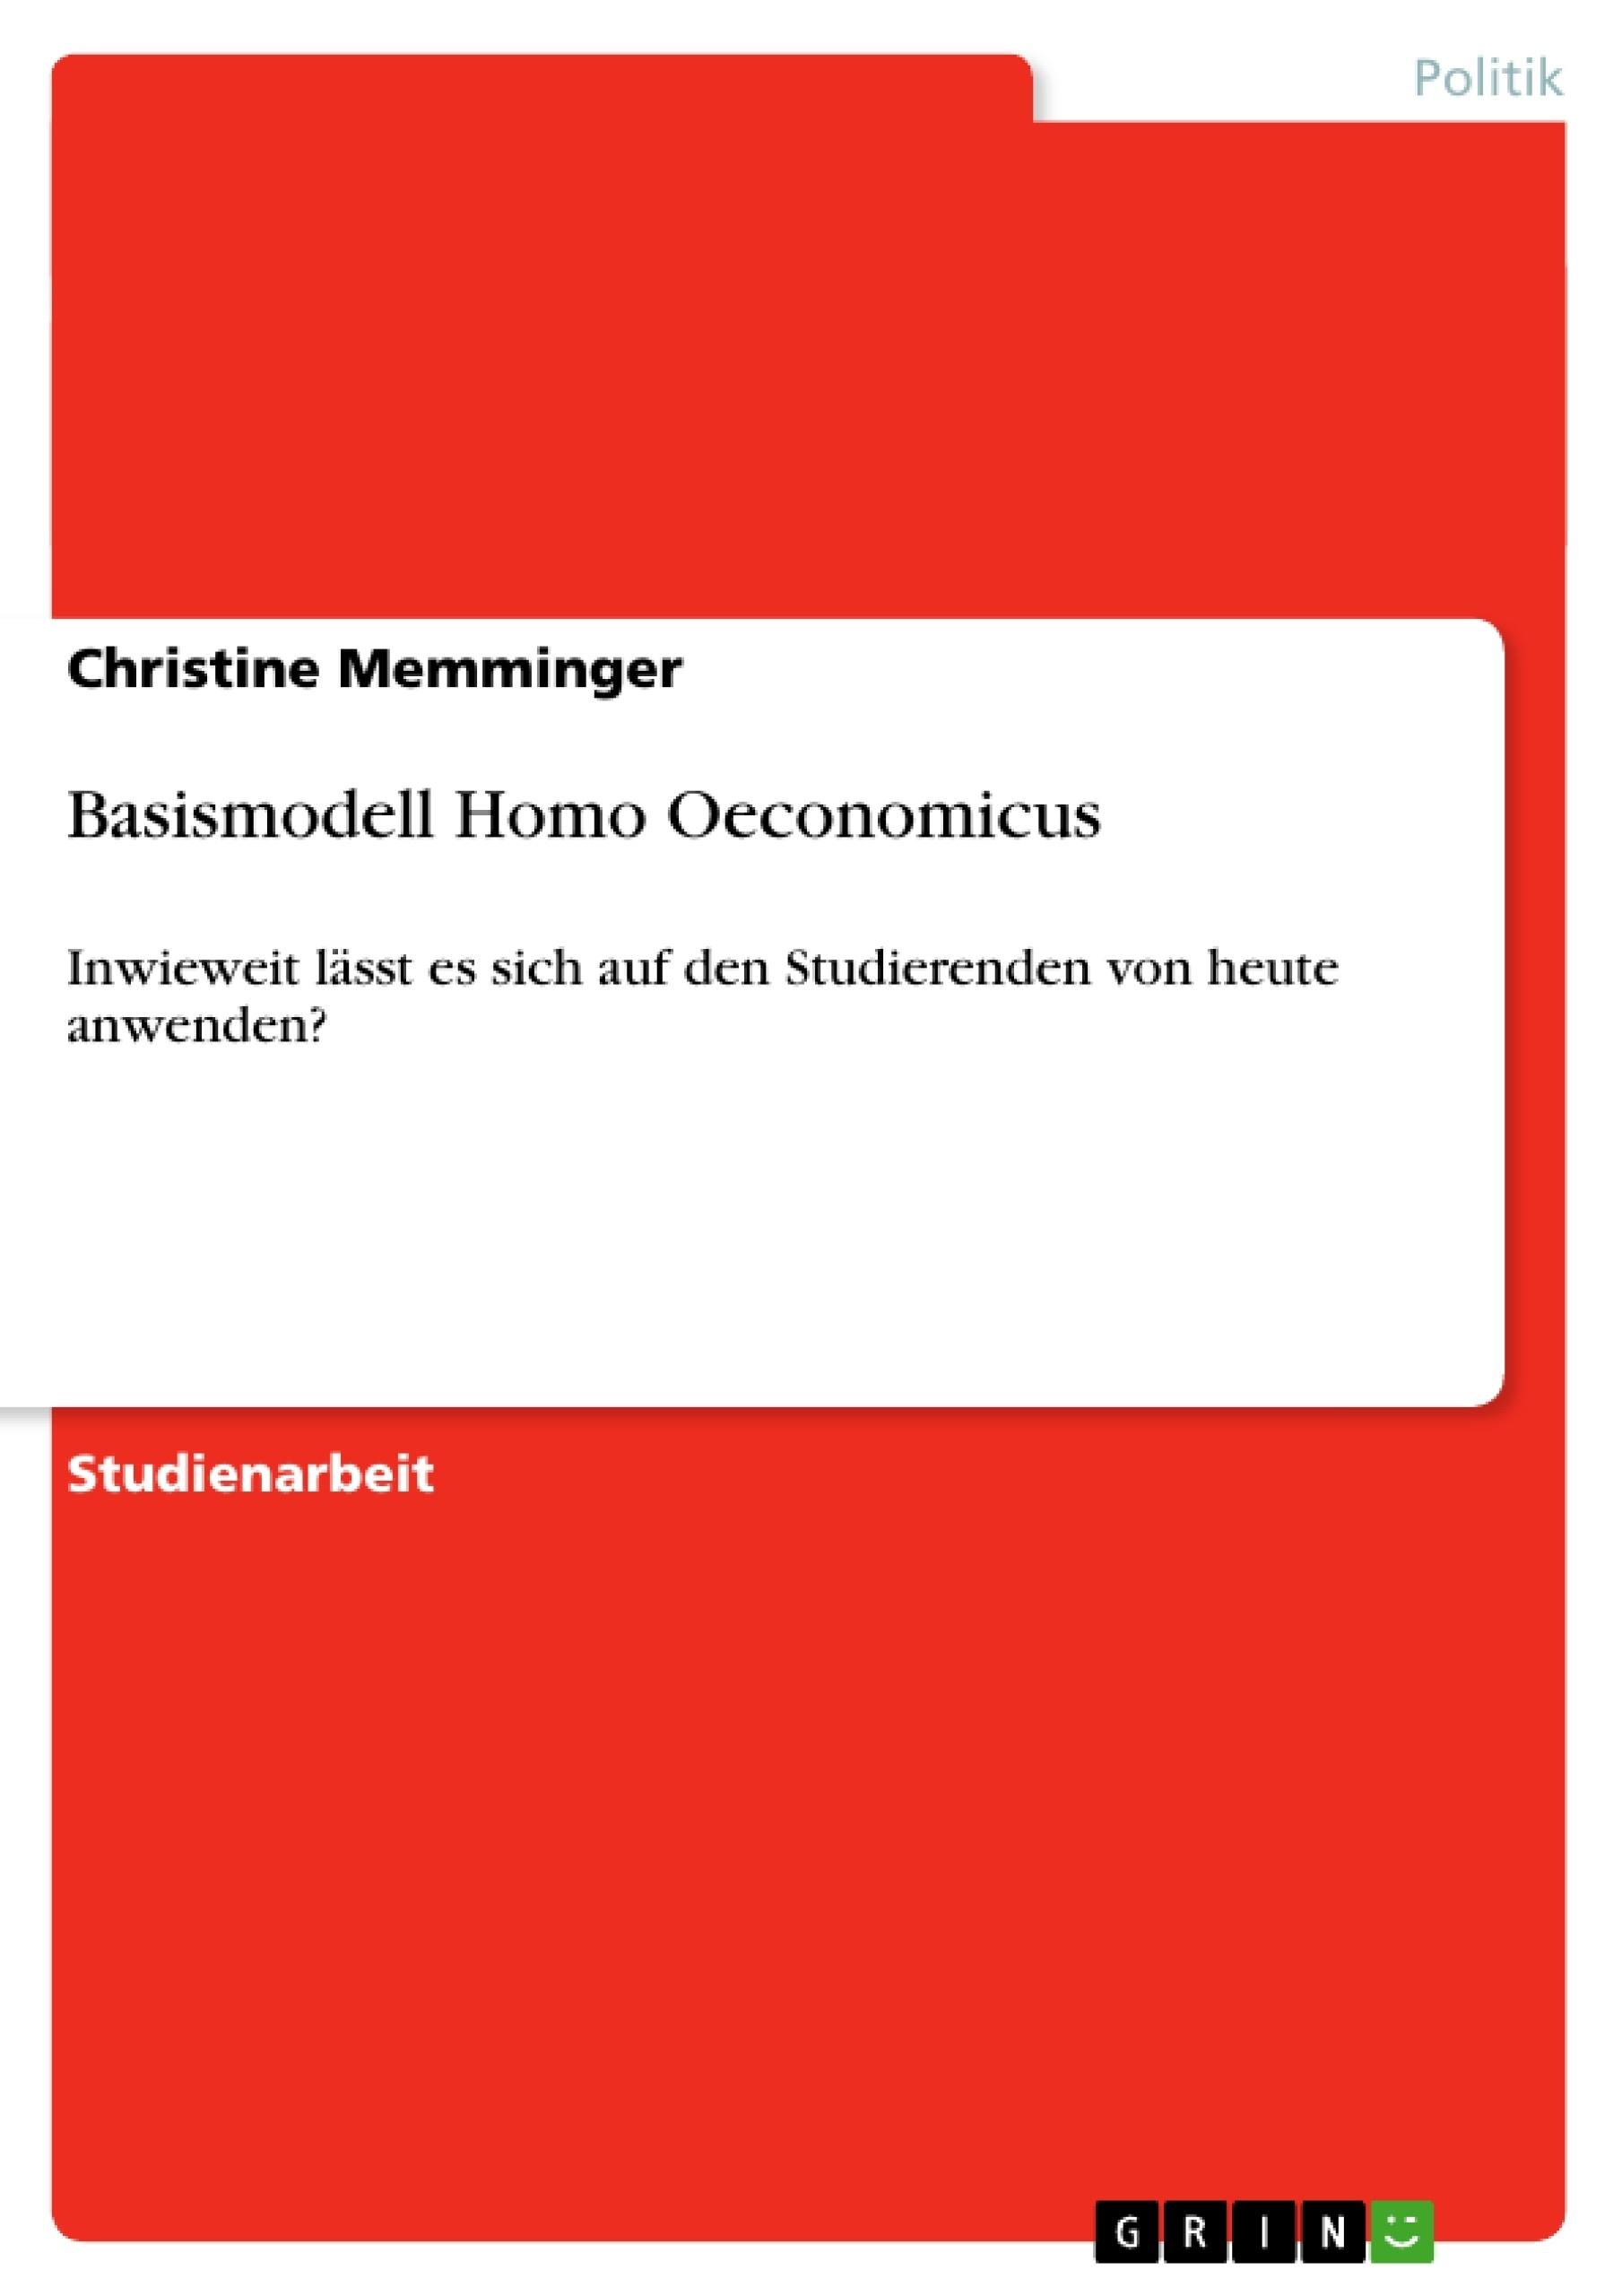 Titel: Basismodell Homo Oeconomicus